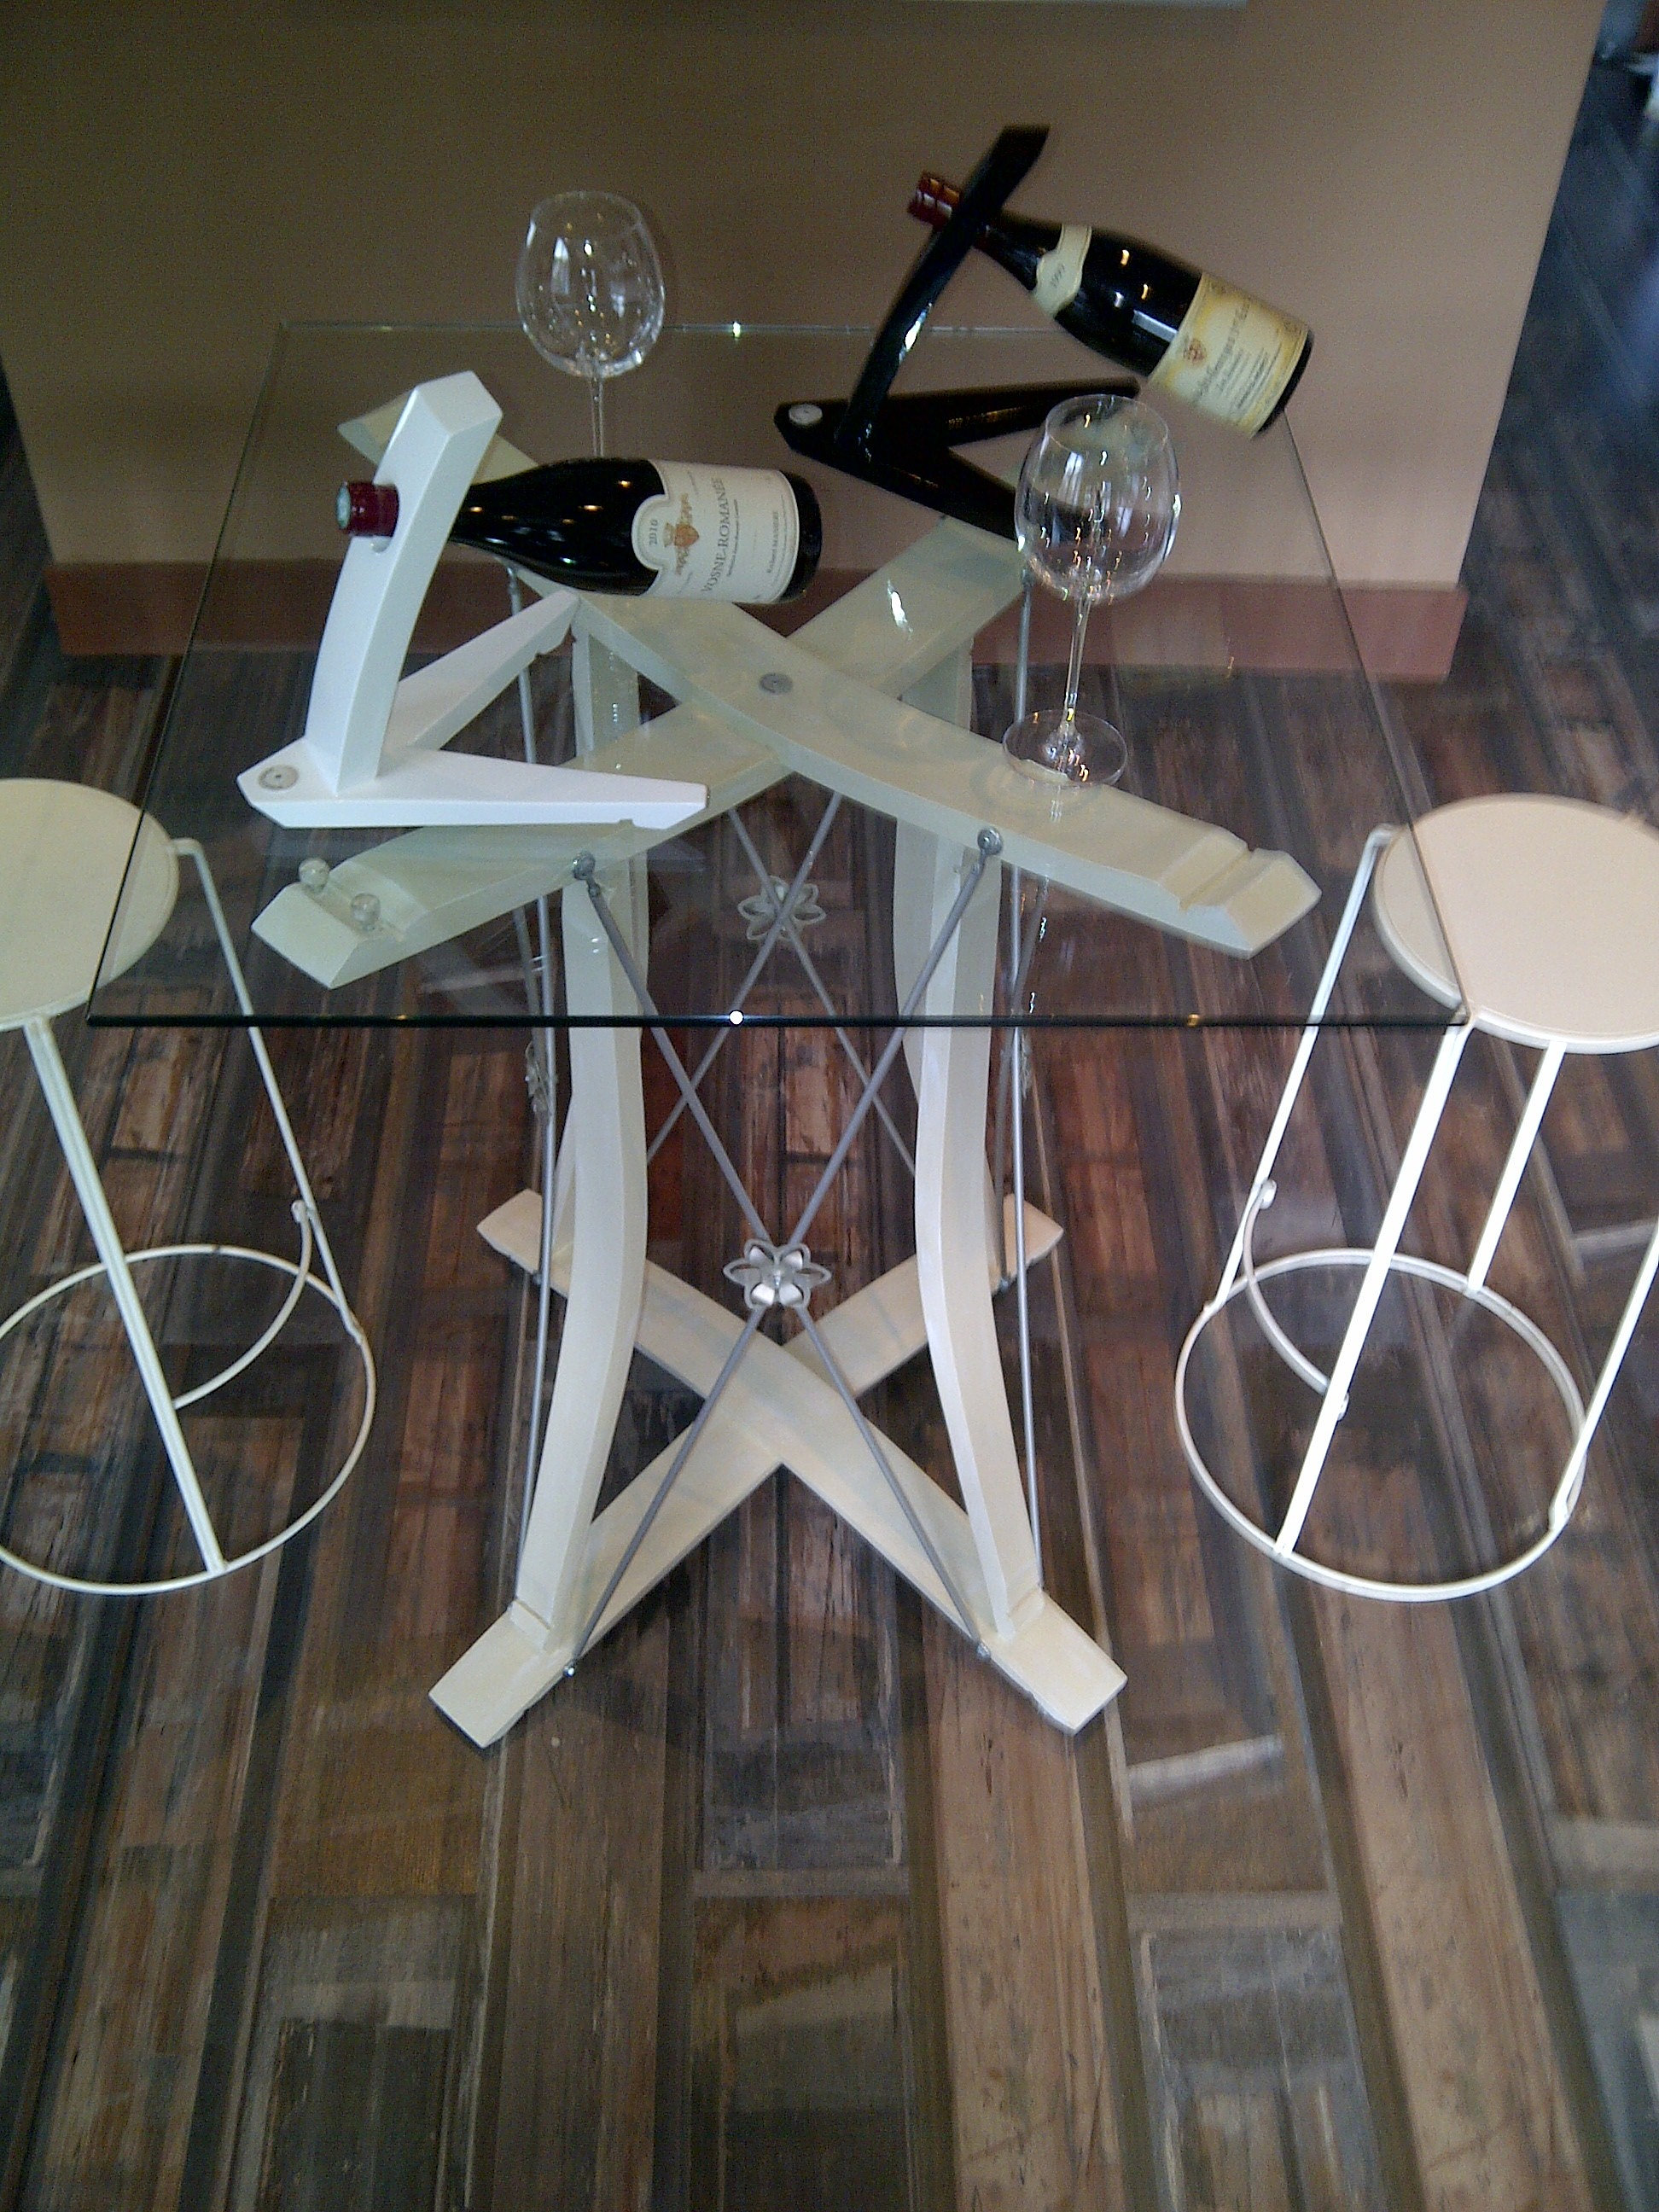 Douelledereve mobilier et objets des grands vins - Mange debout avec rangement ...